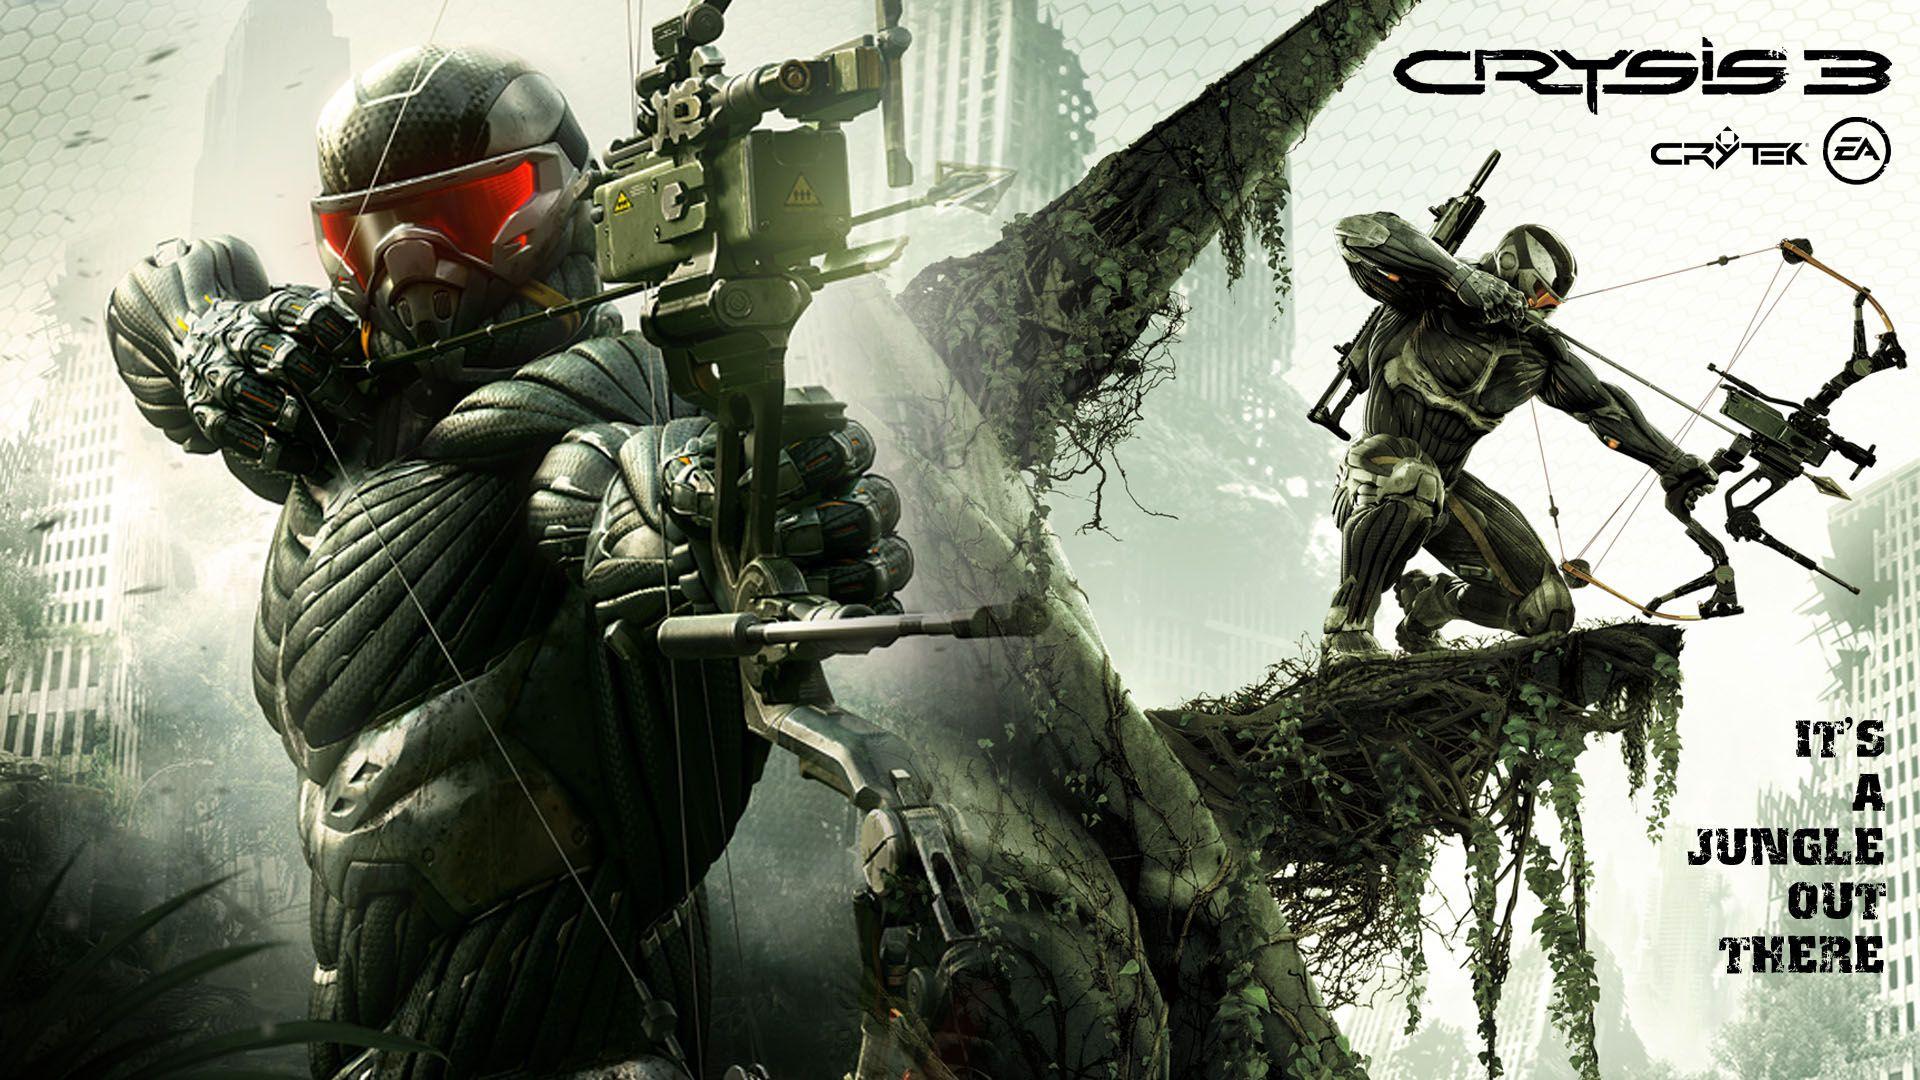 Crysis 3 Full Hd Wallpaper Pack Game Rips Arena Hd Wallpaper Computer Wallpaper Full Hd Wallpaper